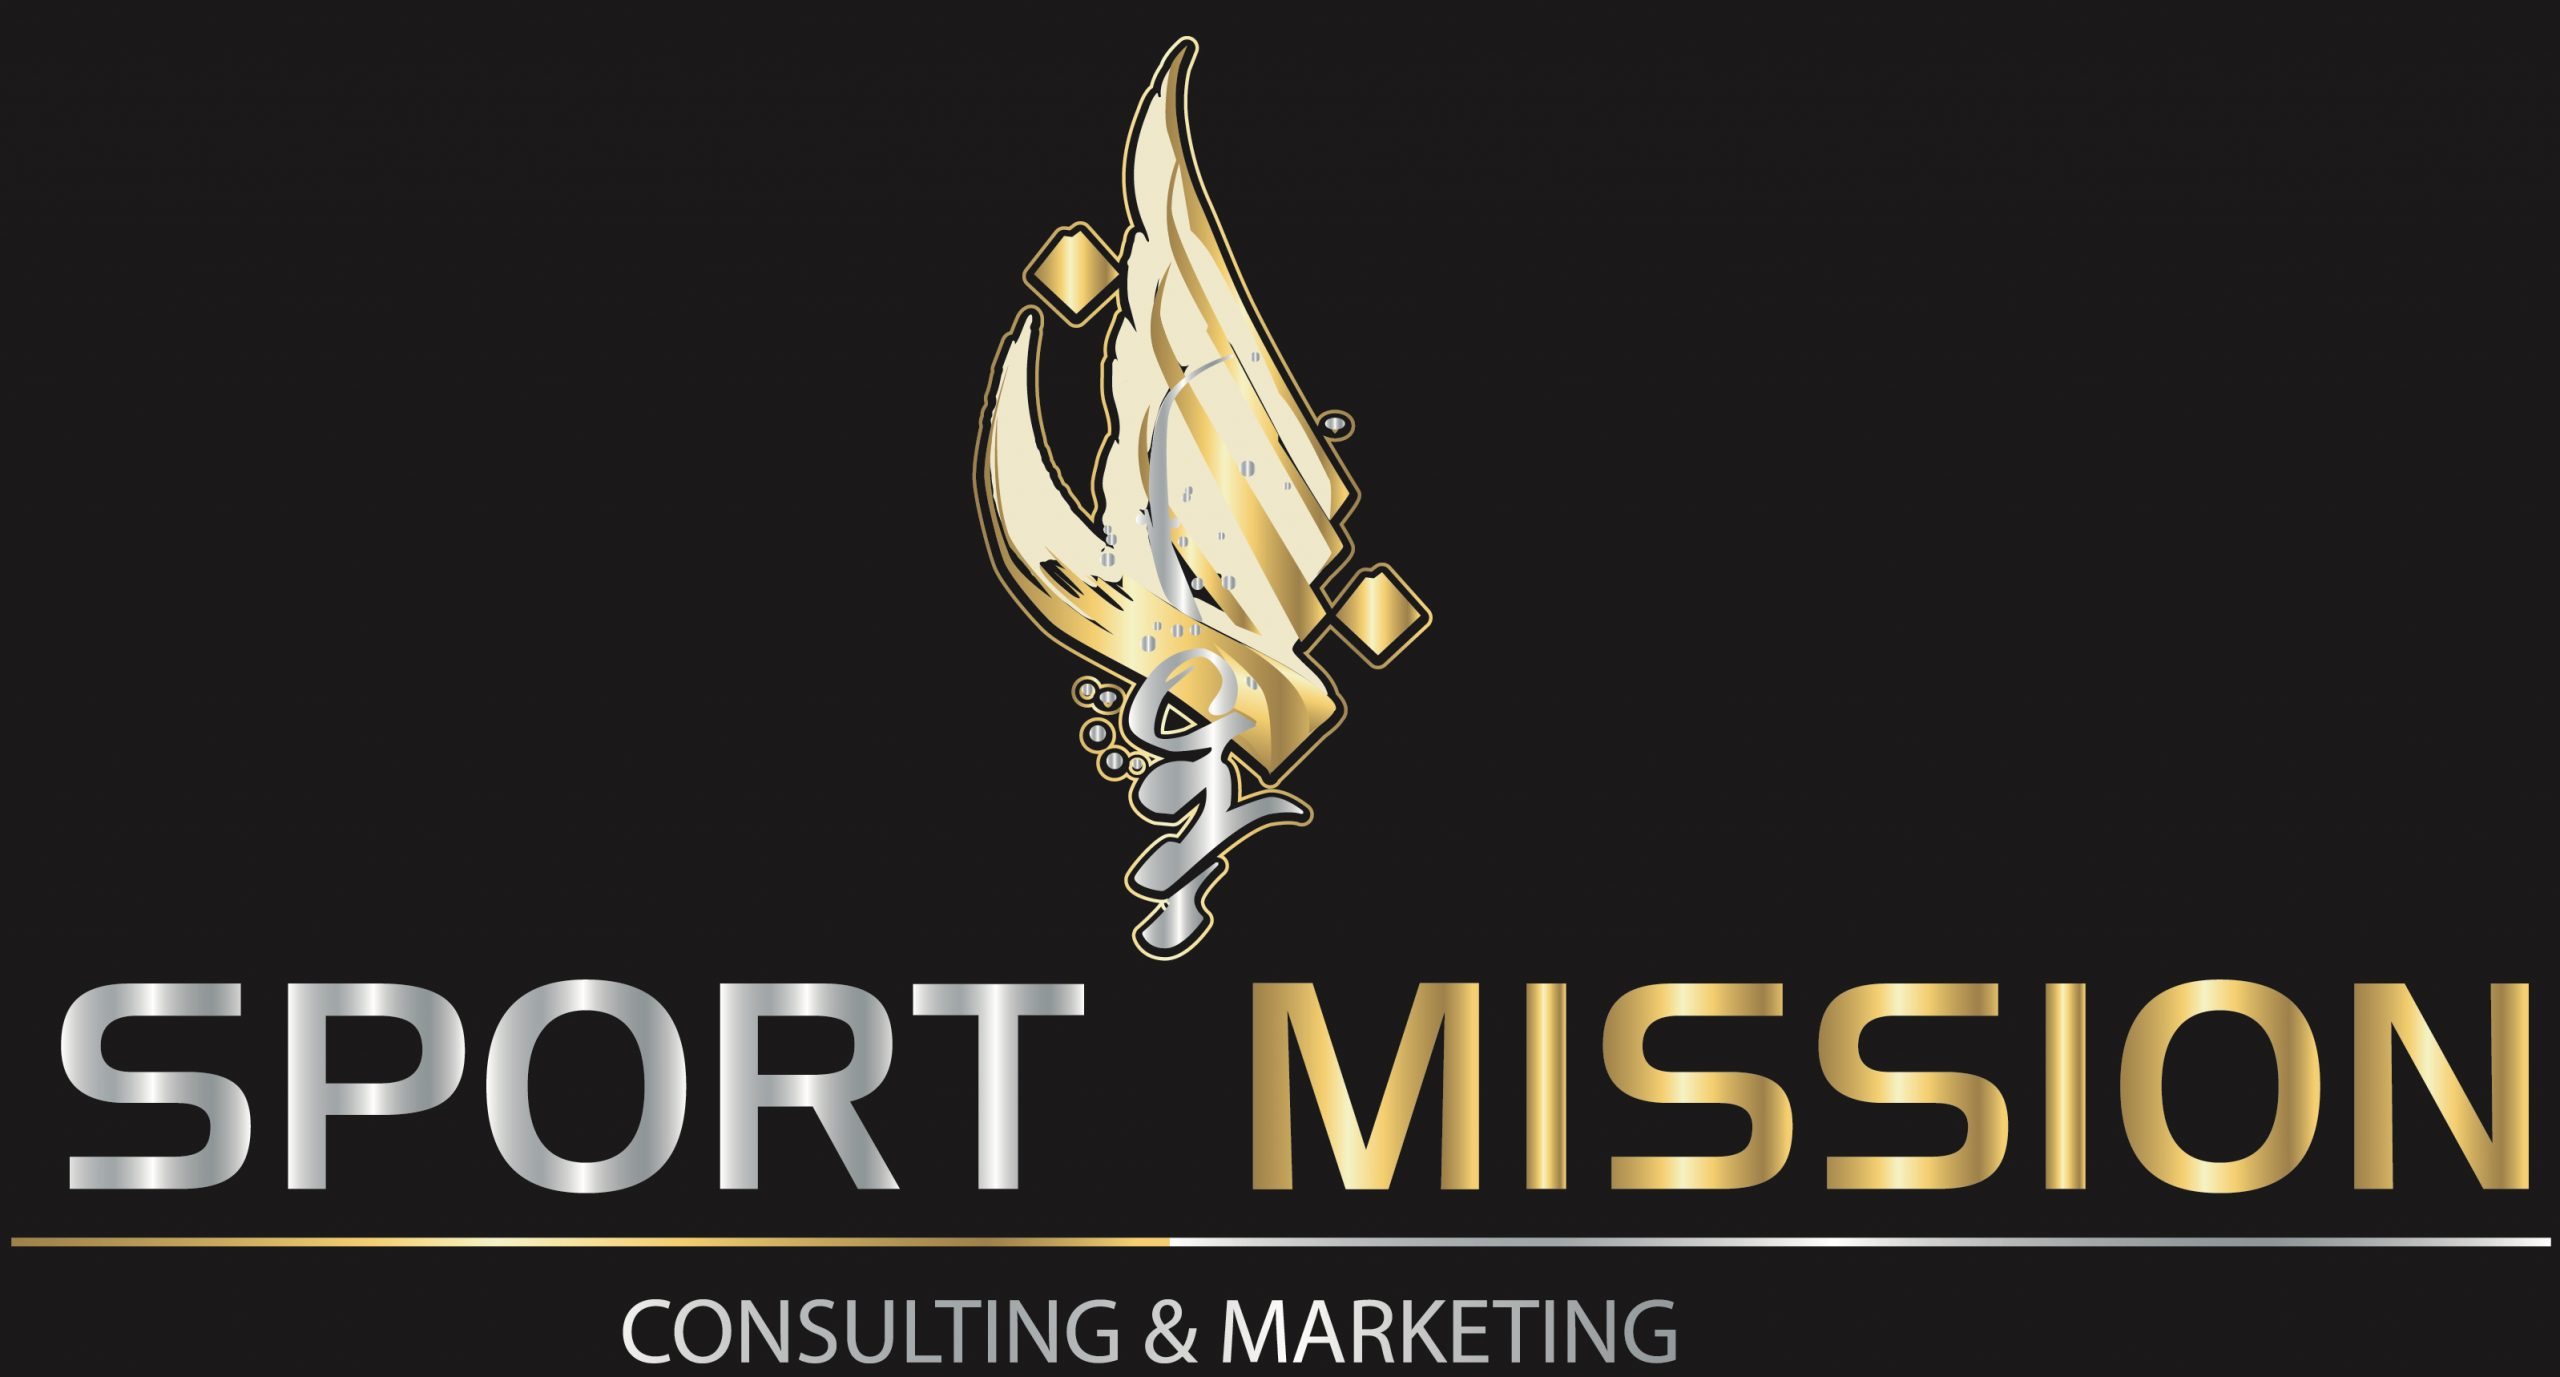 Sport mission